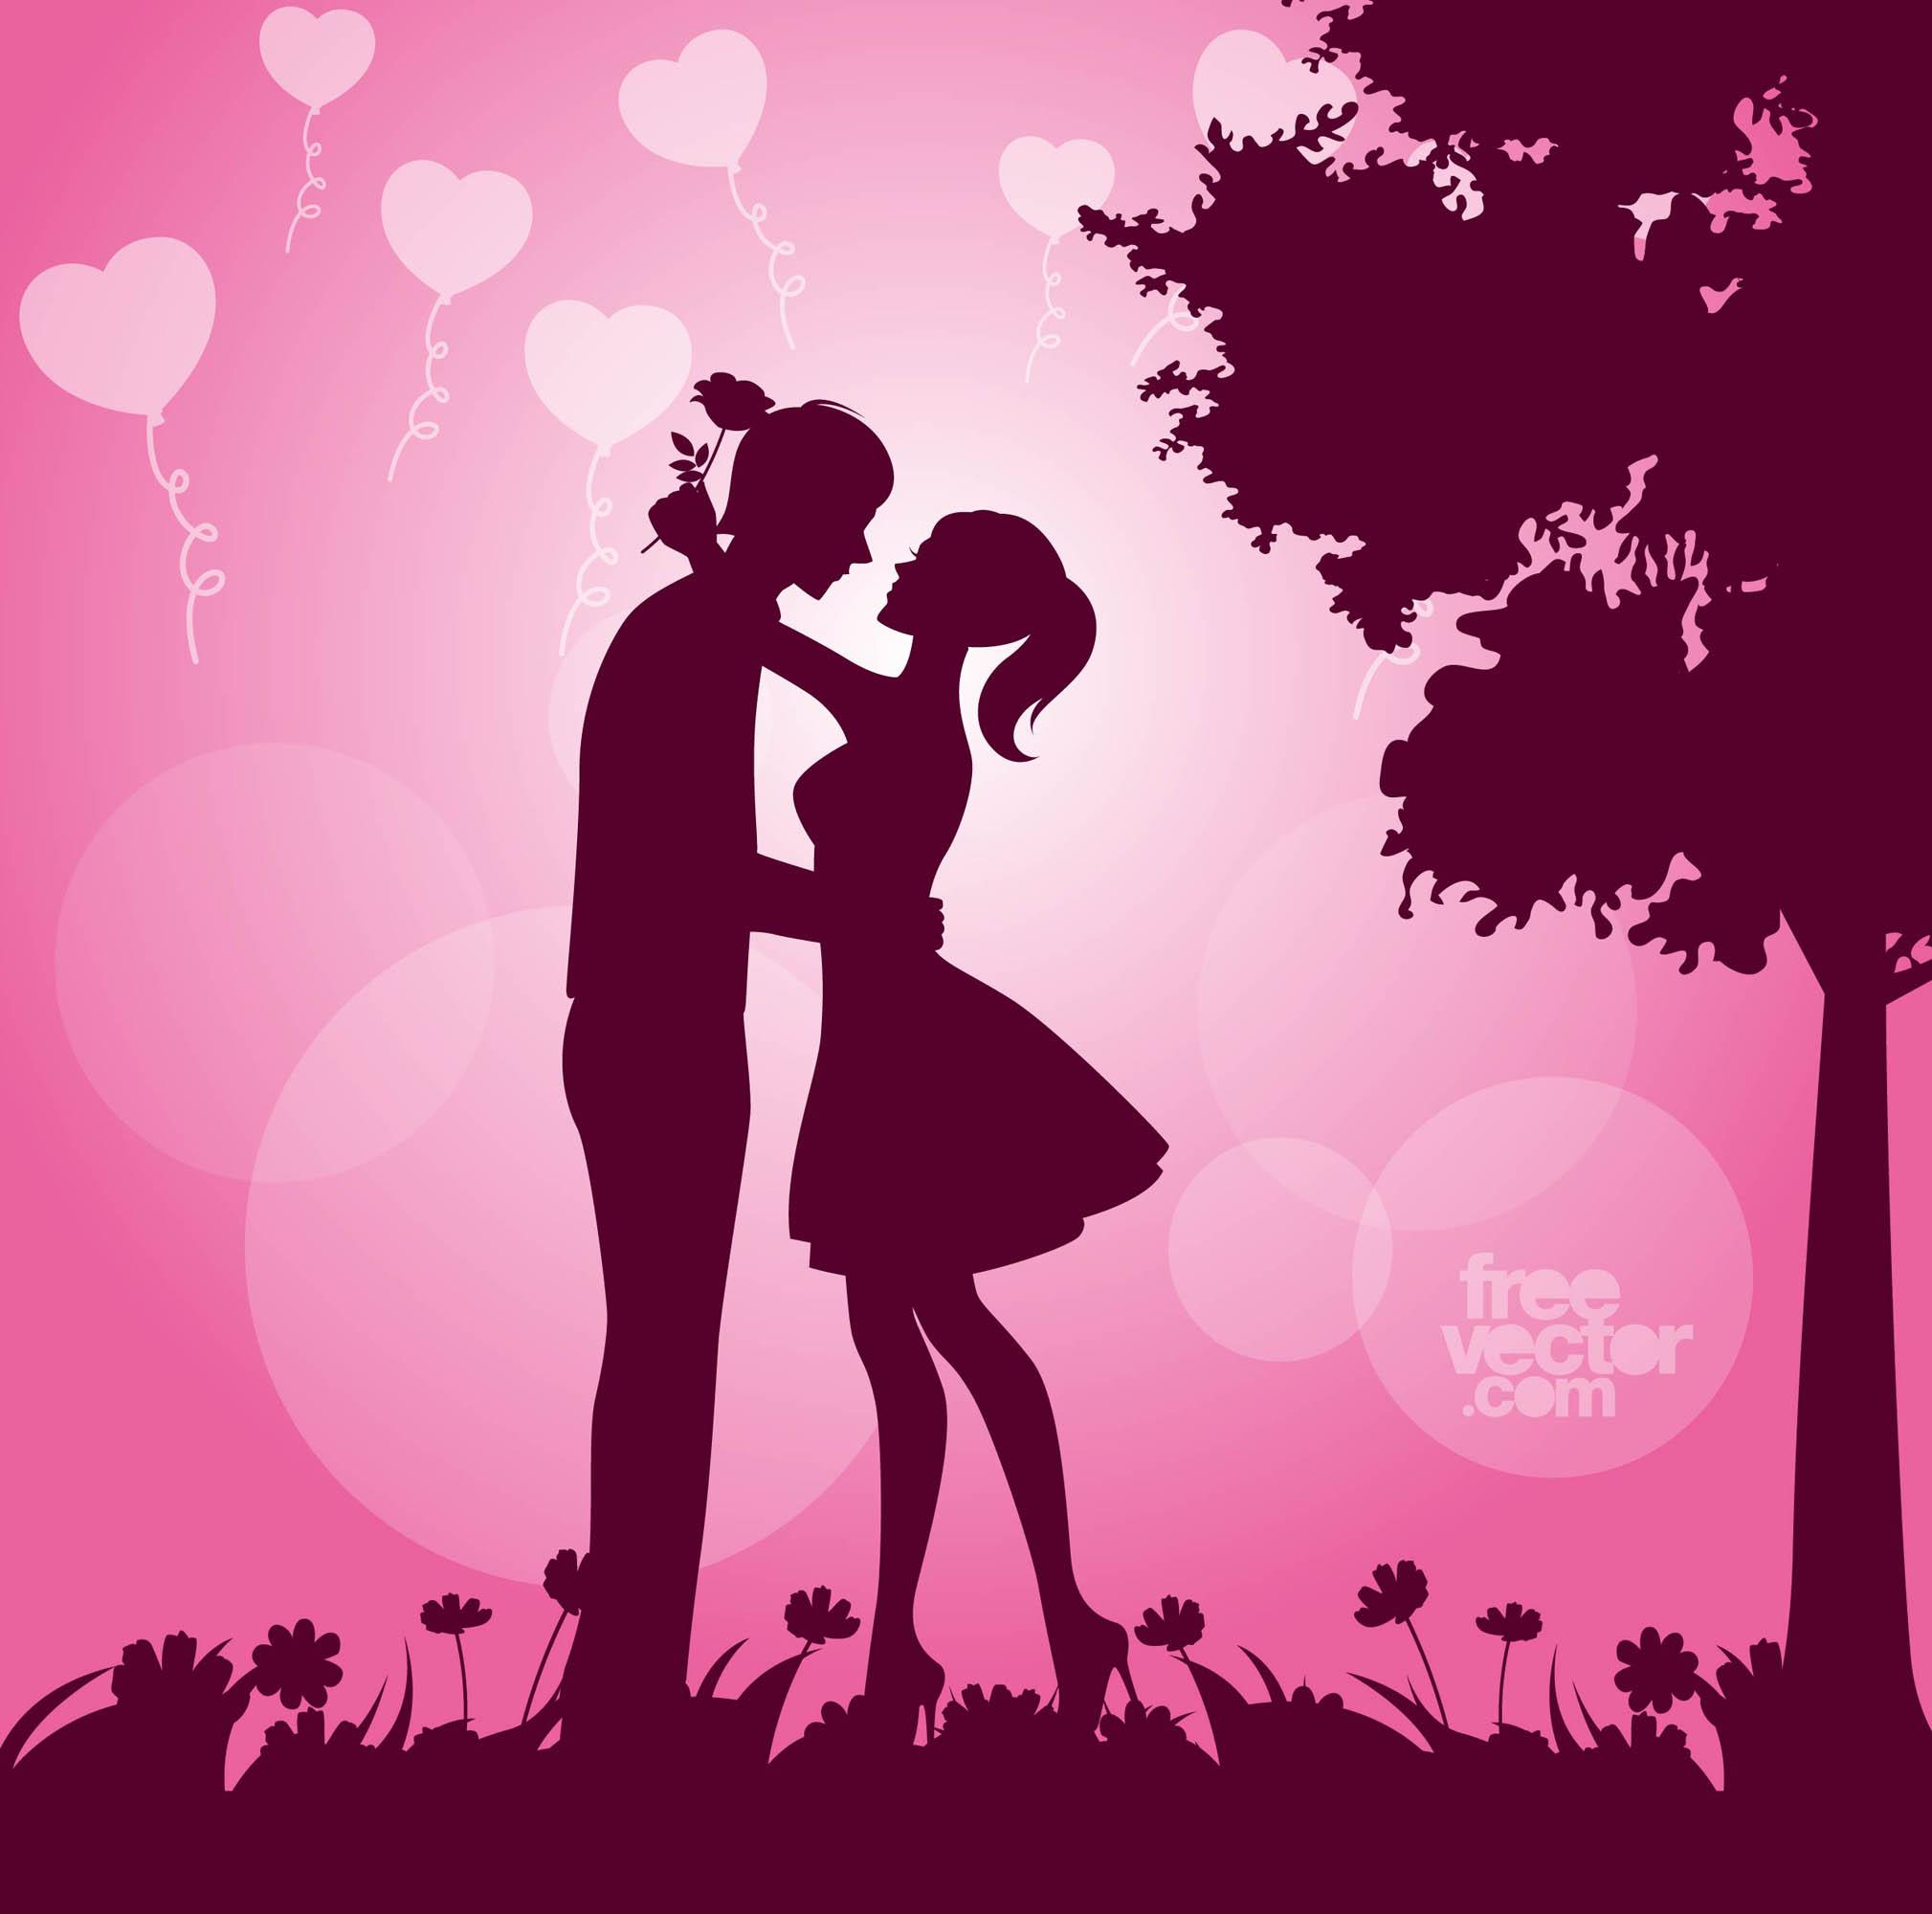 Boy Proposing Girl Hd Wallpaper Valentine Vector Art Amp Graphics Freevector Com